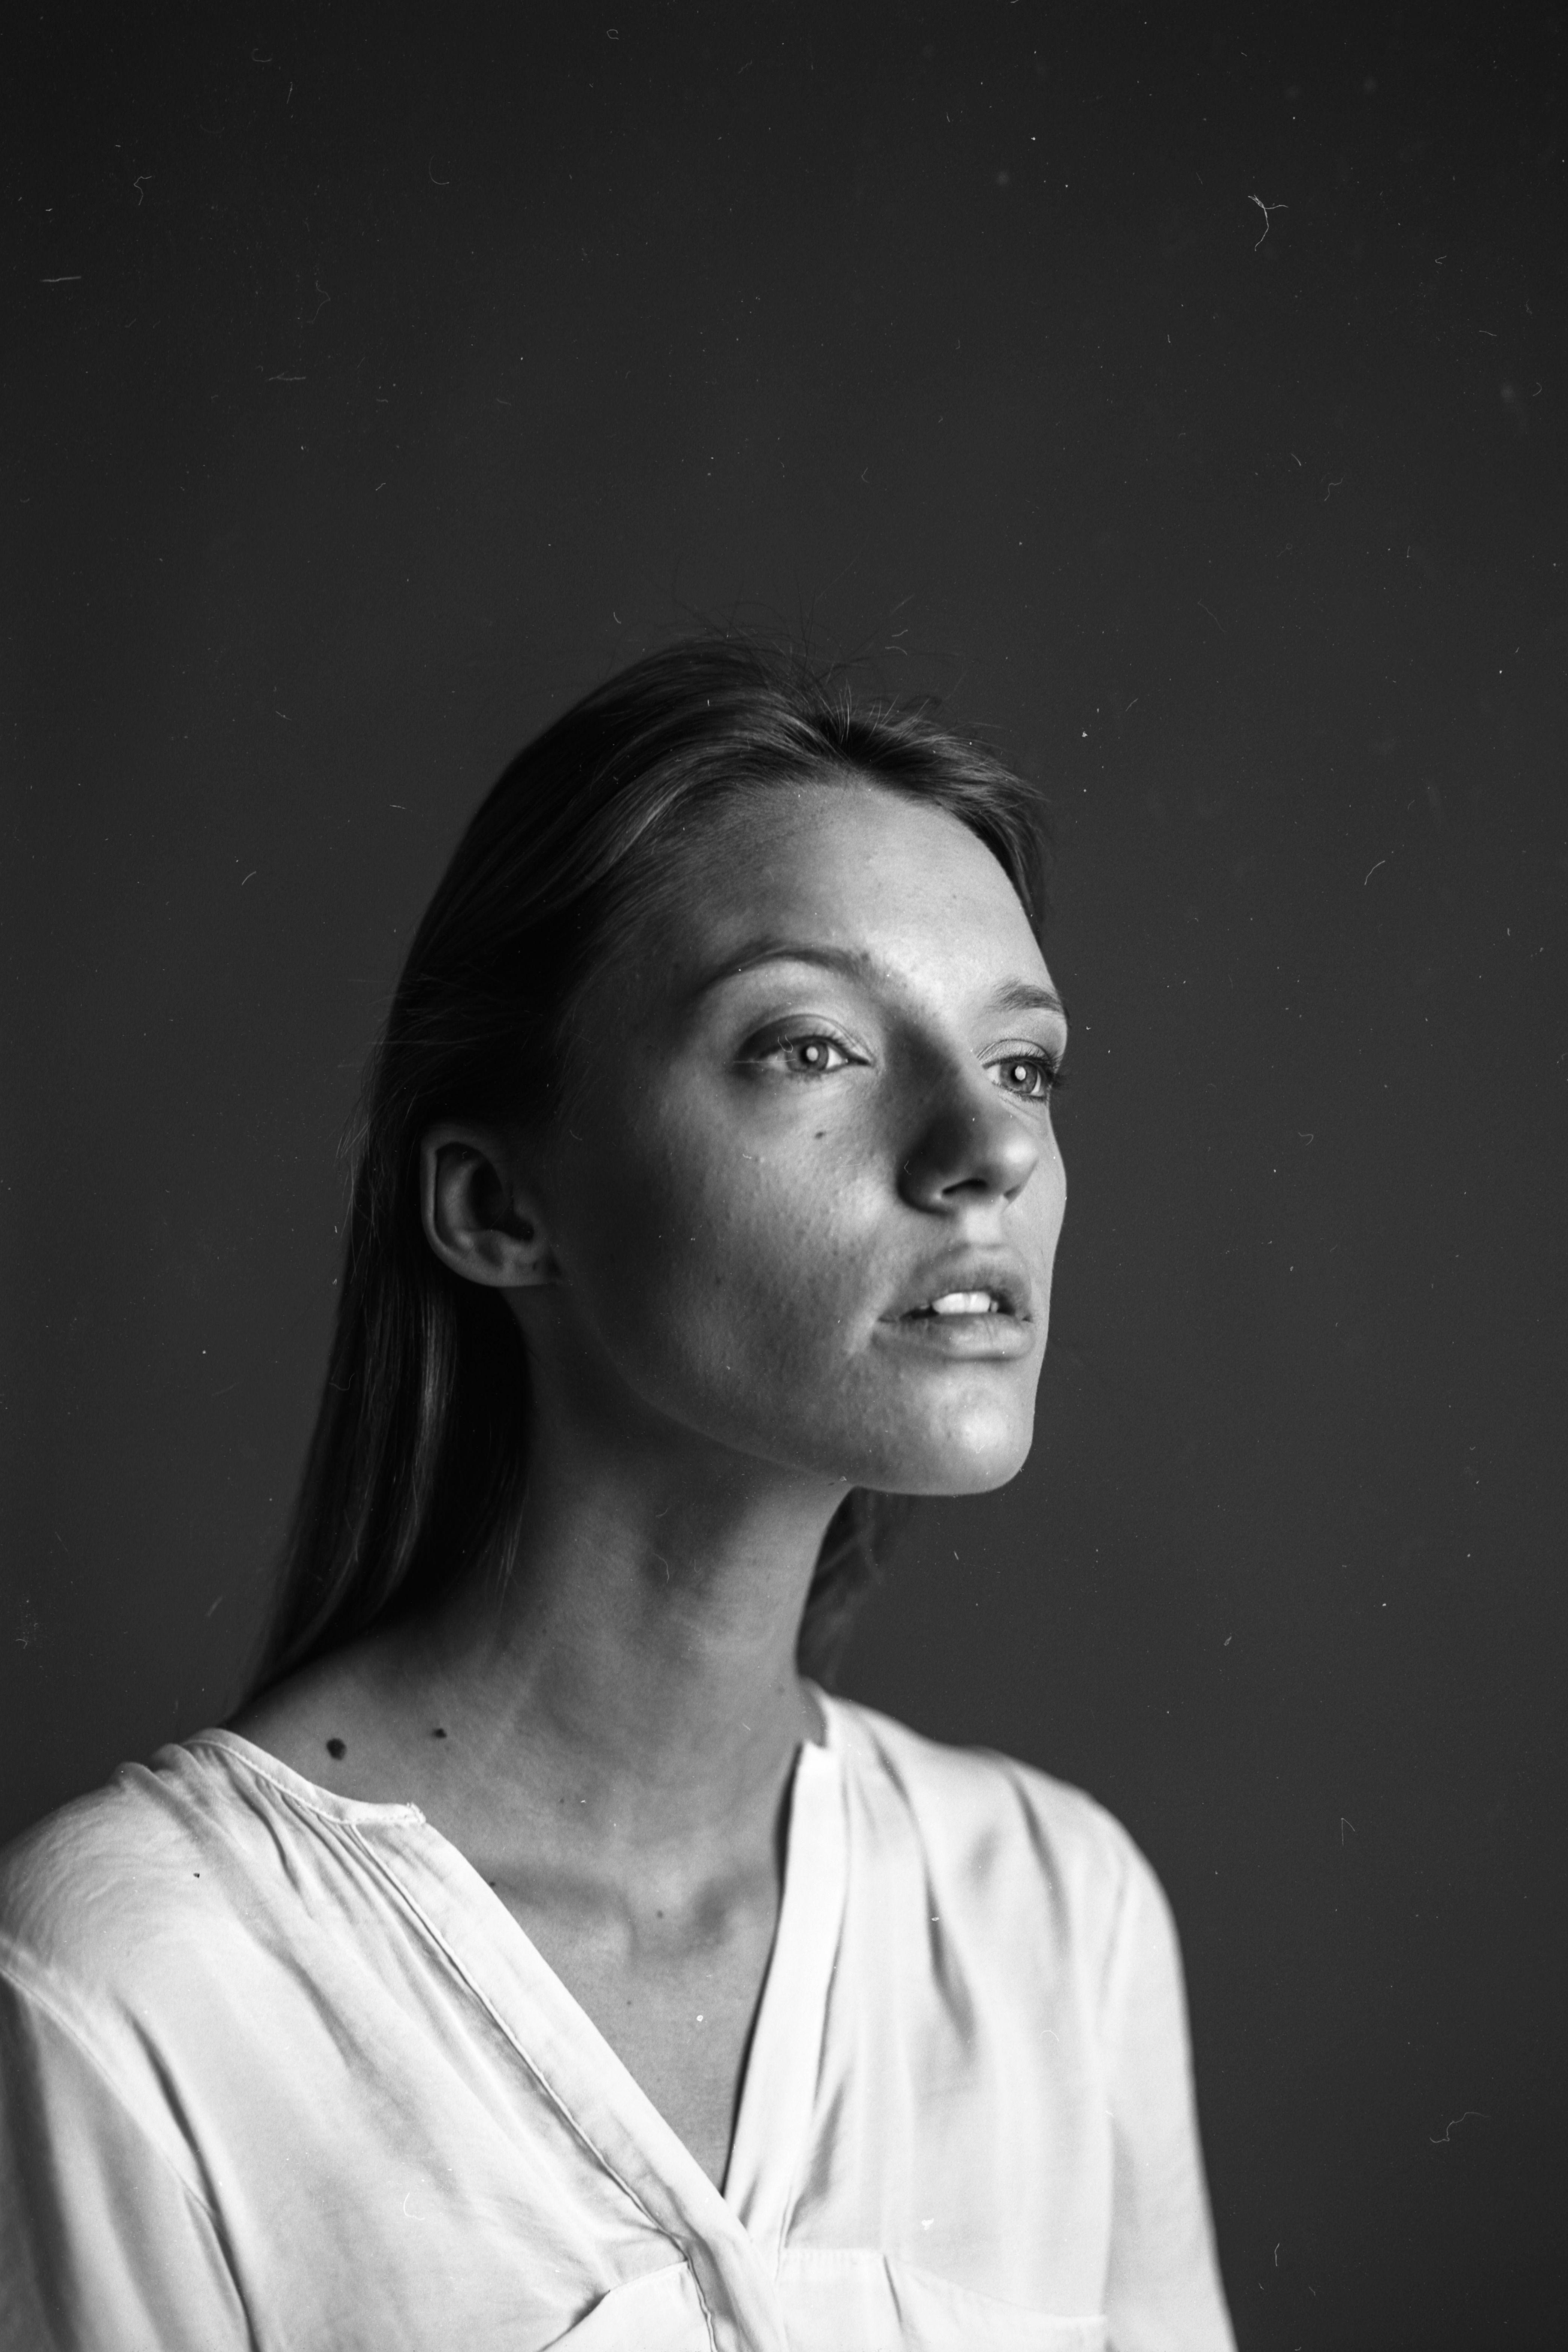 Black and white portrait with Mamiya rz67 pro 2   Mamiya